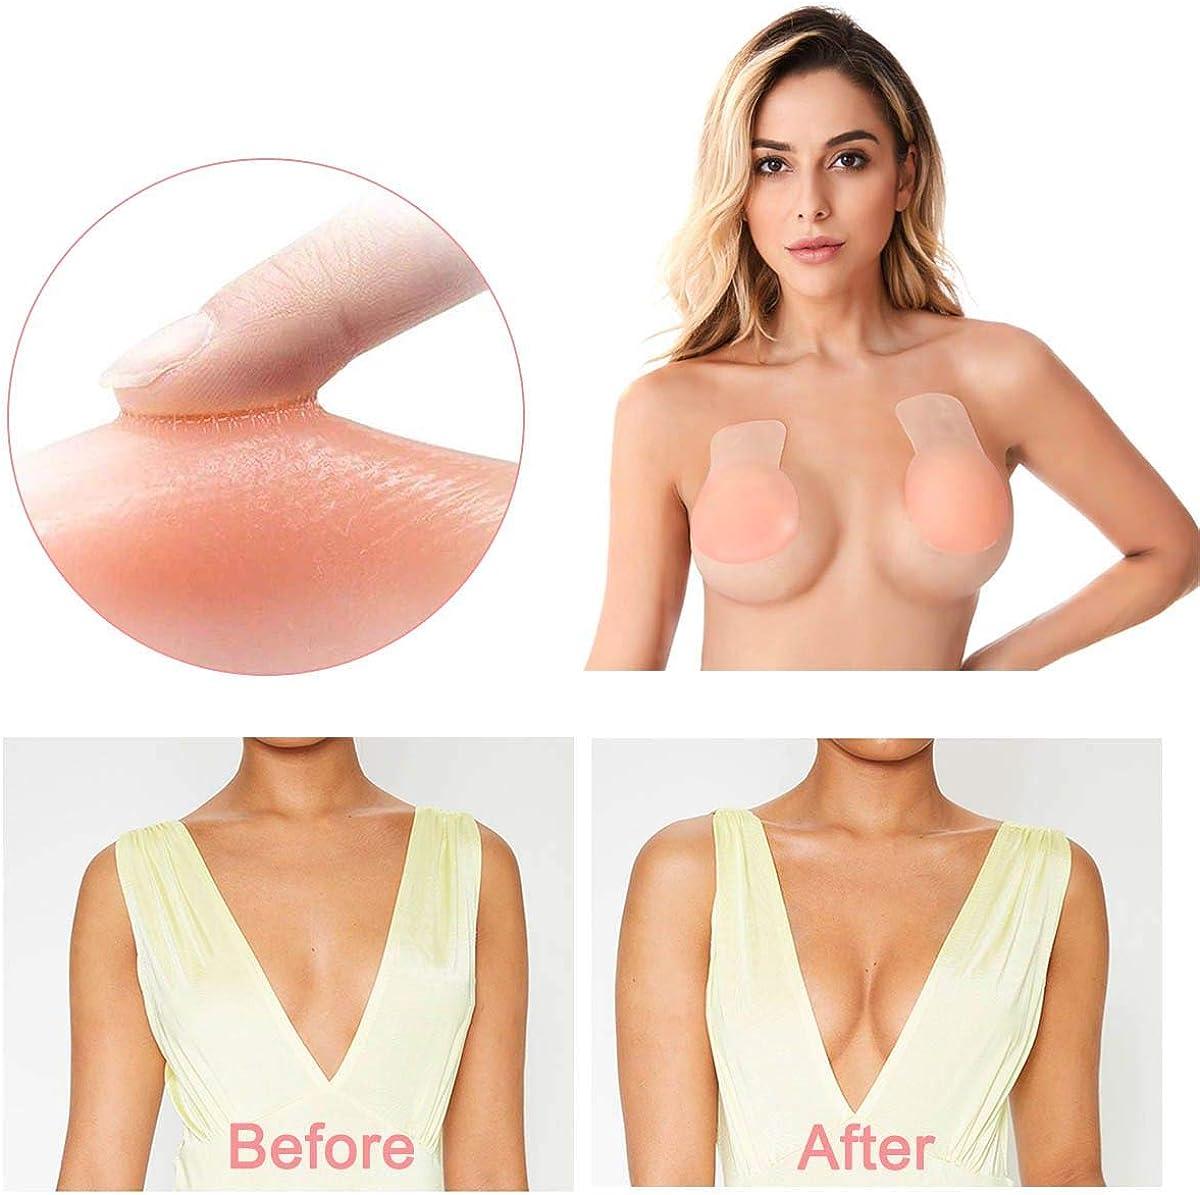 Lift Nipple Covers Strapless Bra for Women Breast Lift Tape Nippleless Cover